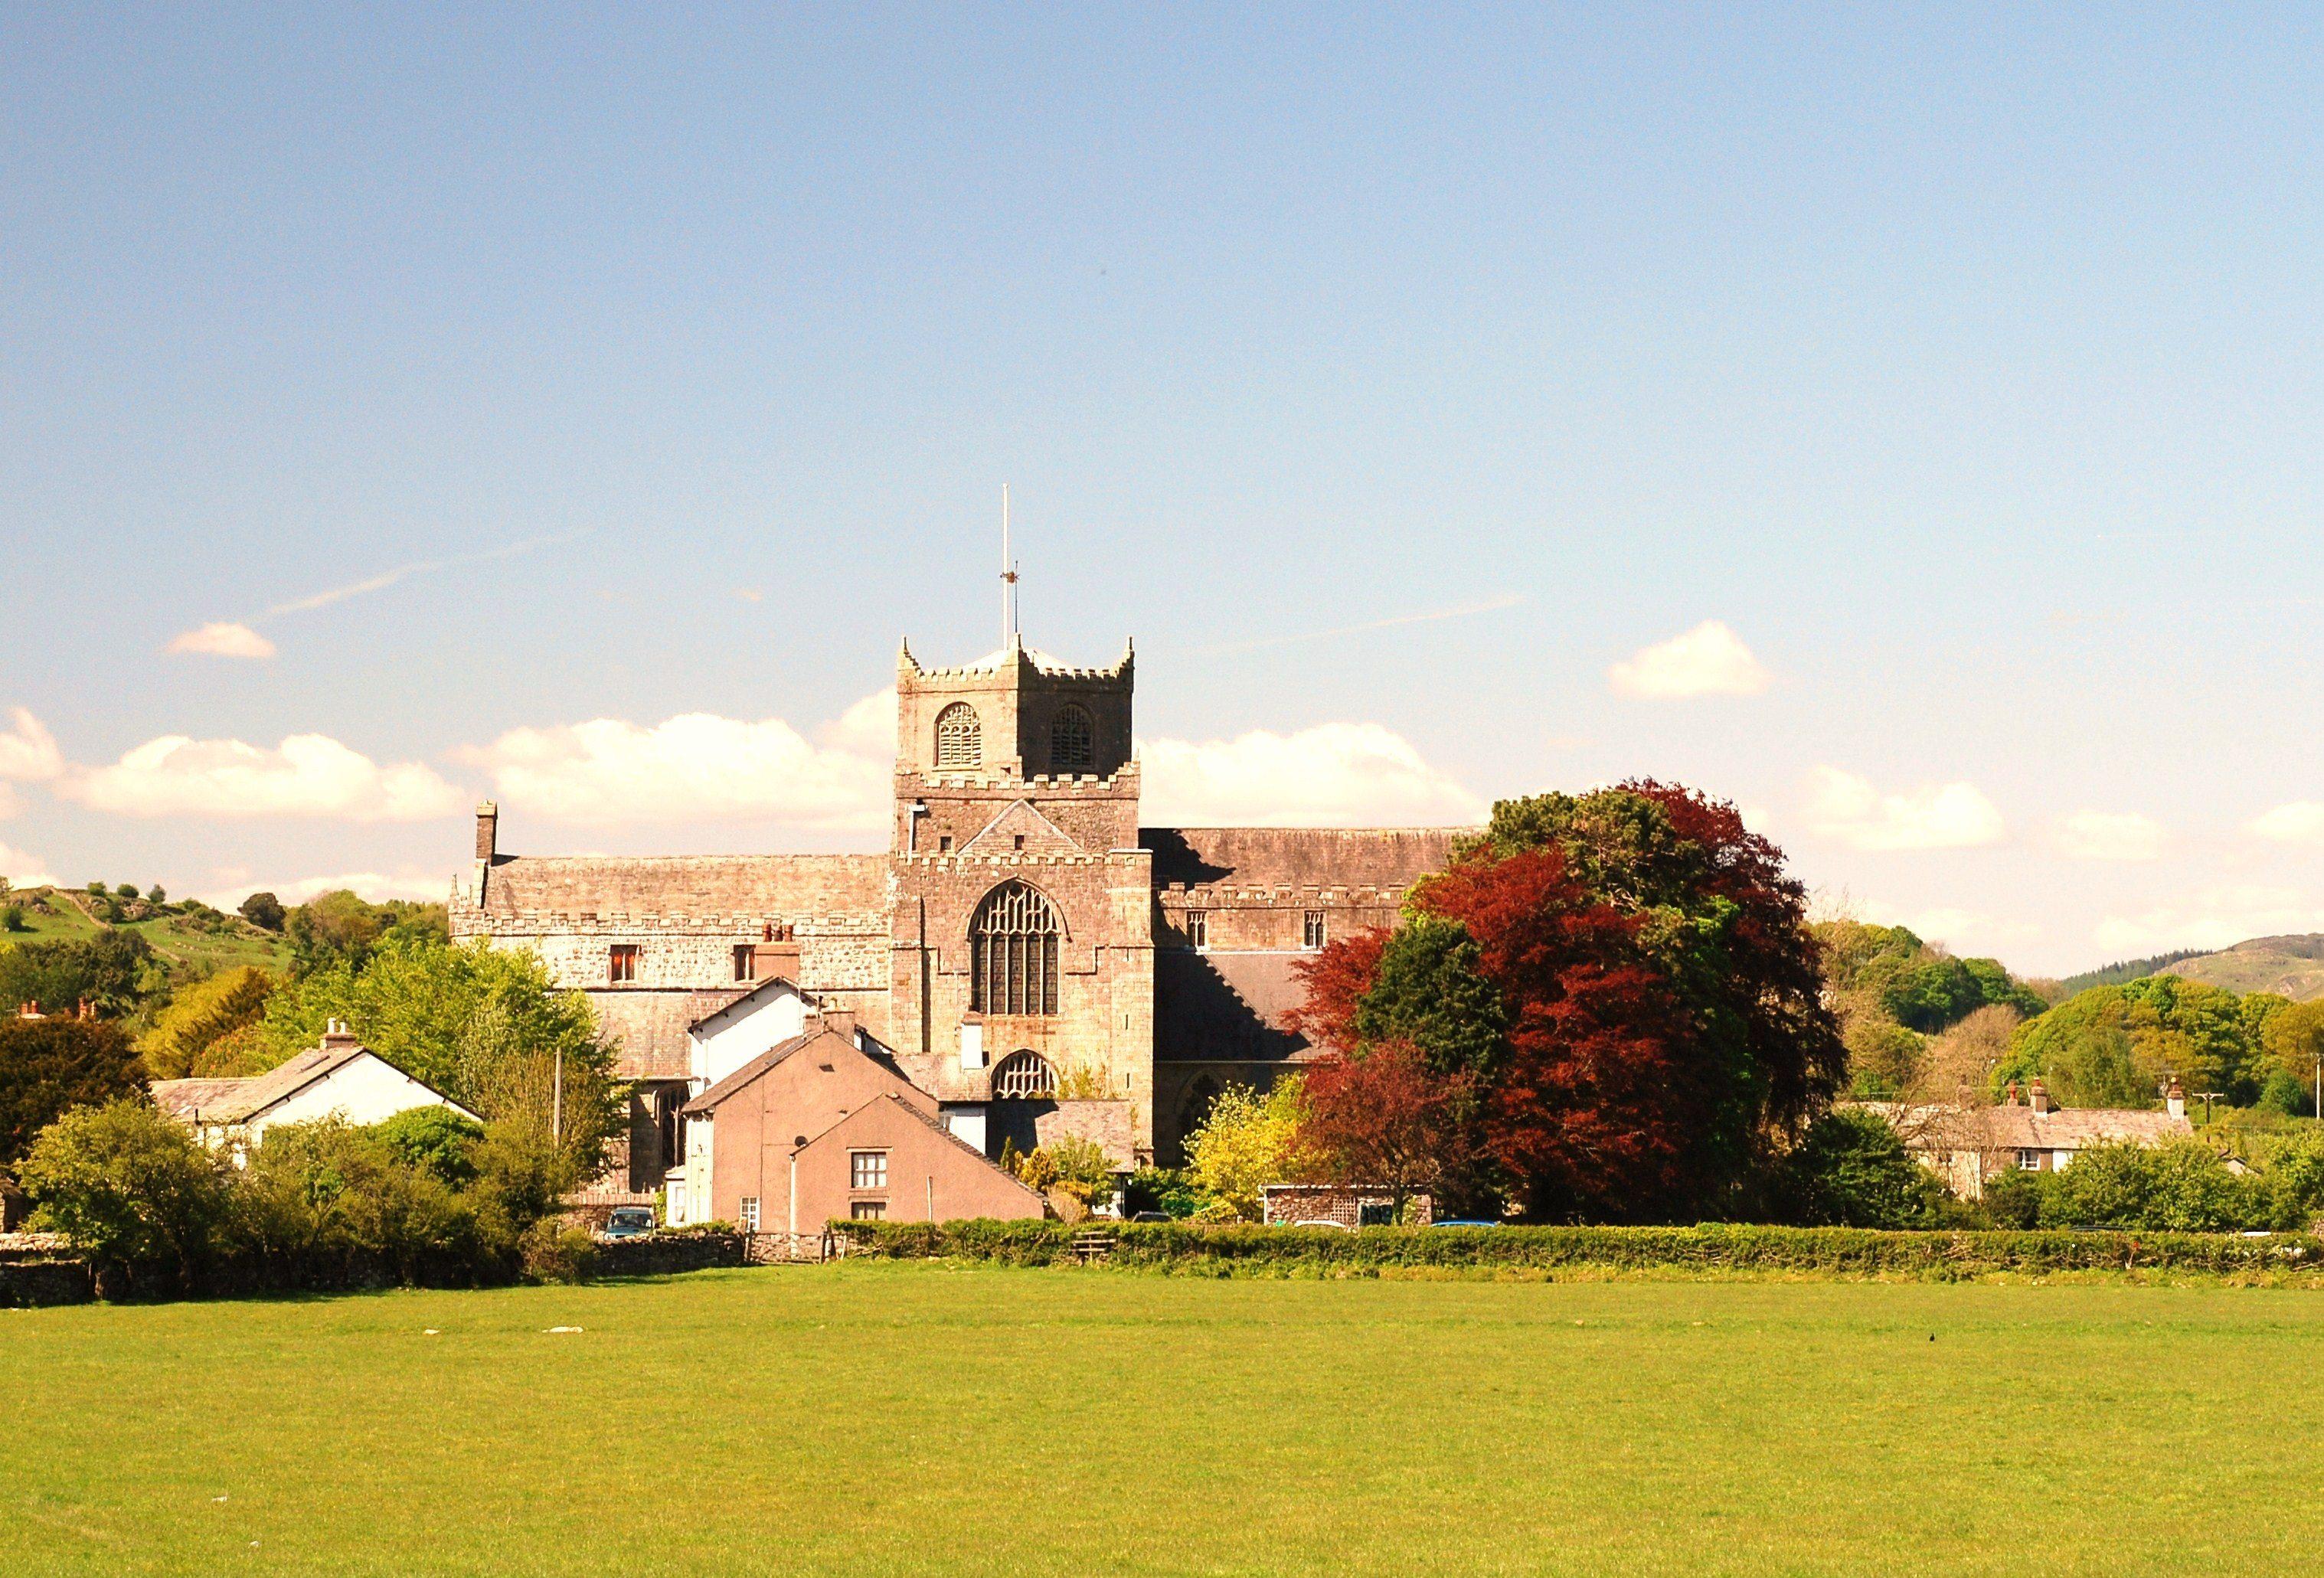 Cartmel Priory in summer